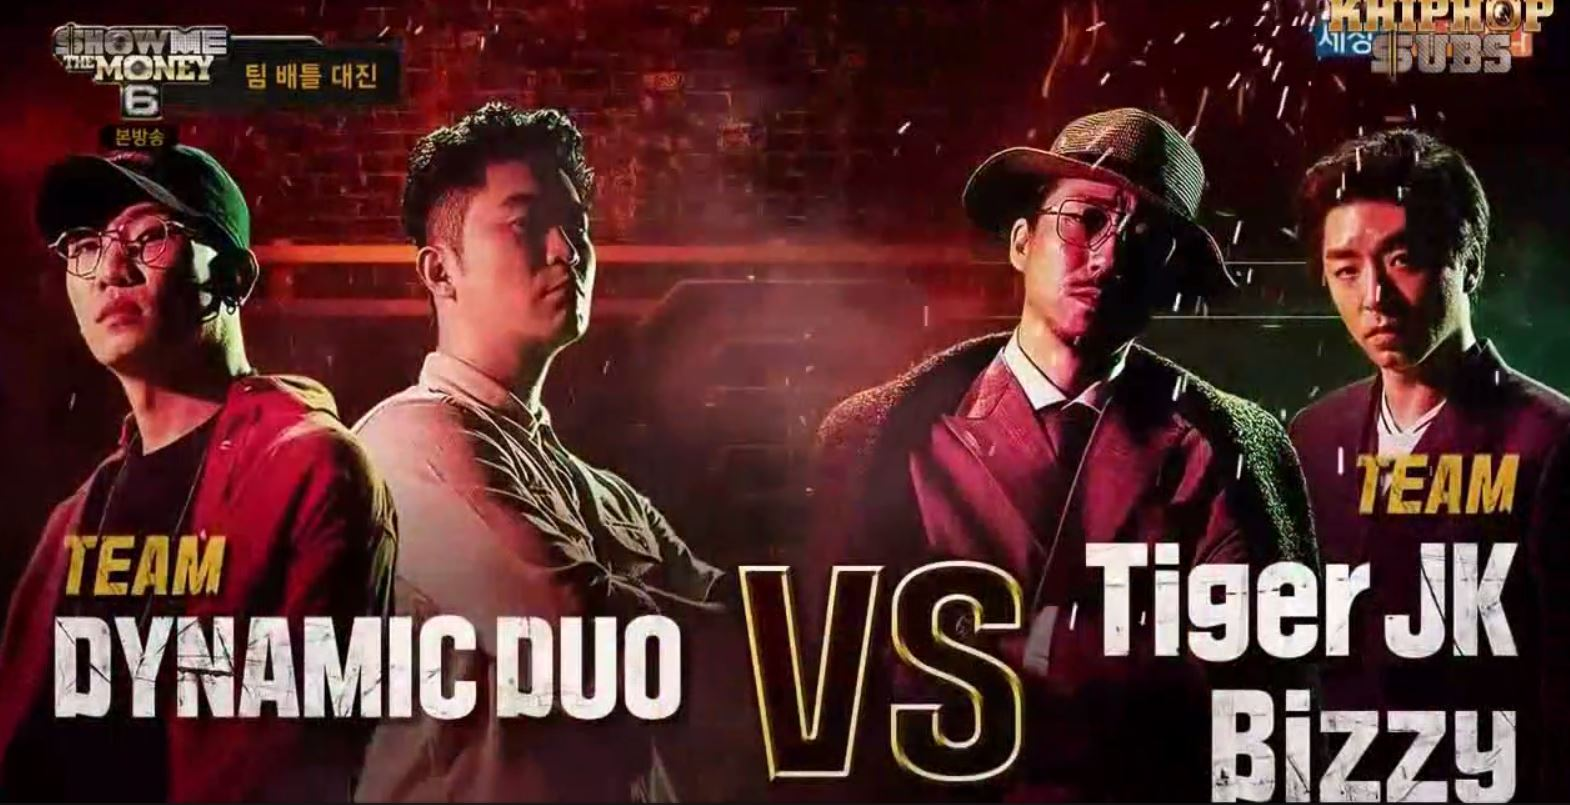 Dynamic Duo vs Tiger JK Bizzy